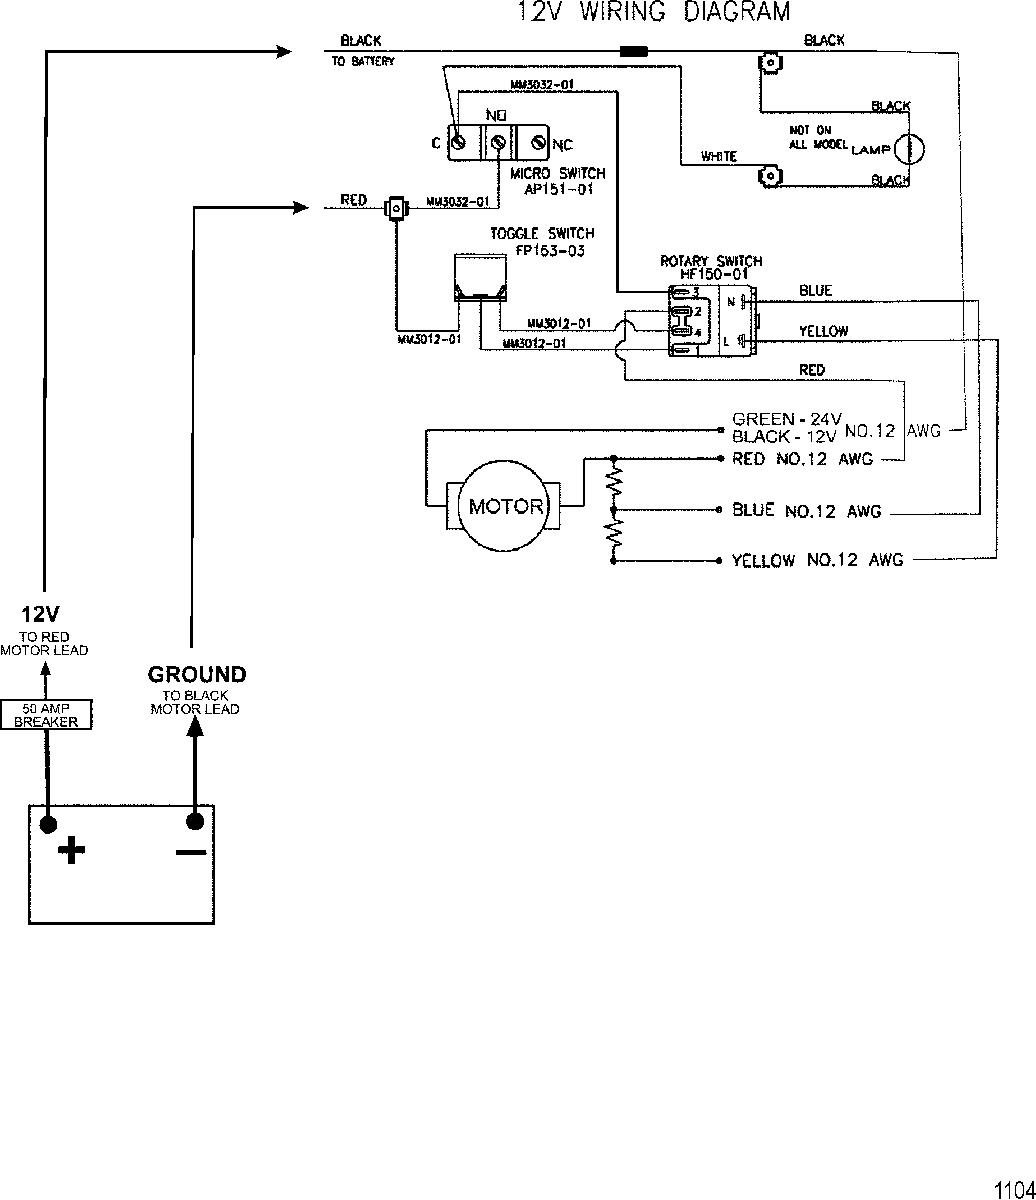 12 Volt Trolling Motor Wiring | Wiring Diagram - 36 Volt Trolling Motor Wiring Diagram